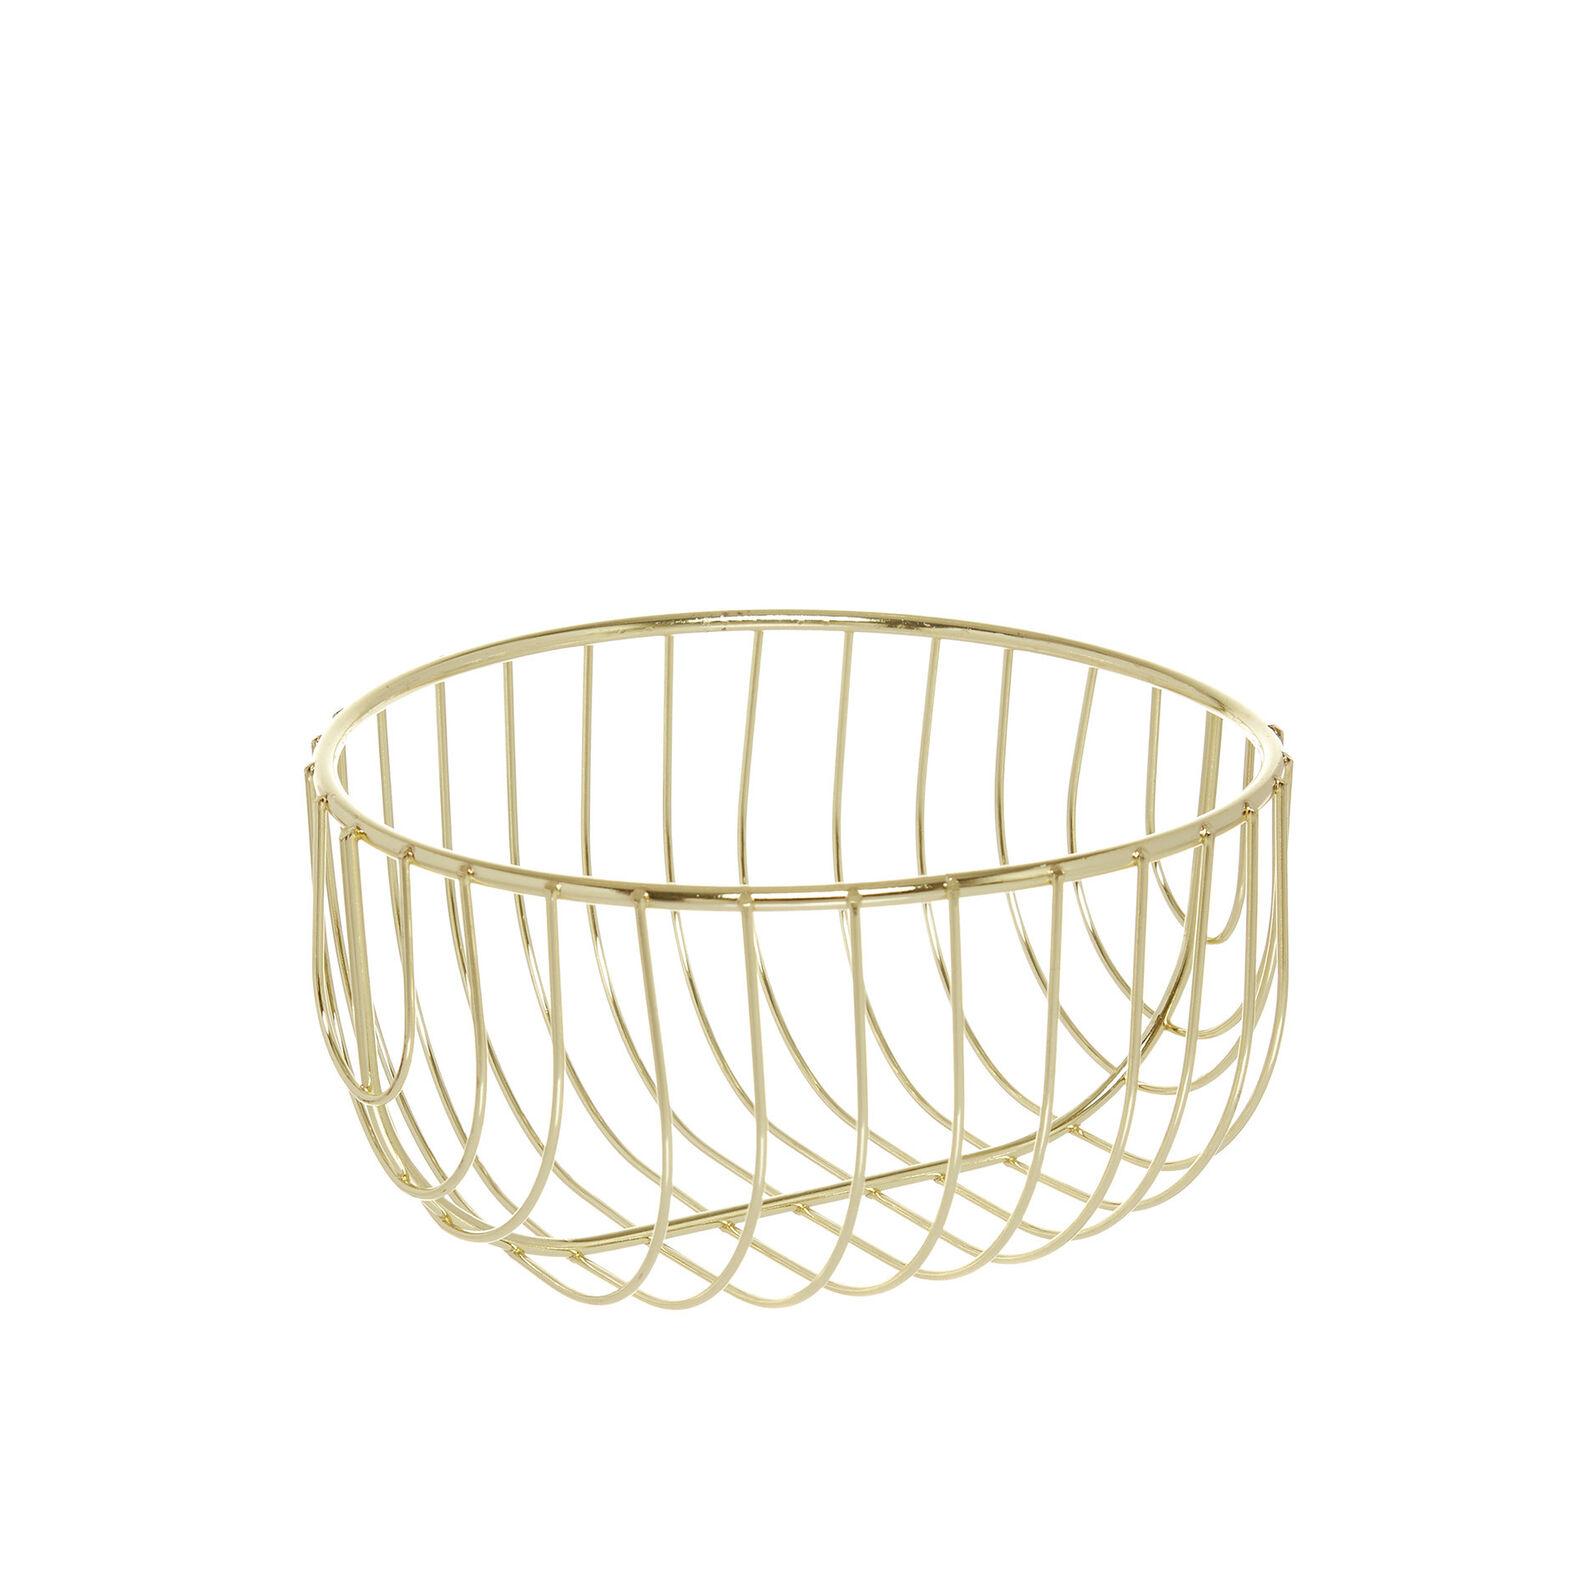 Gold wire bread basket